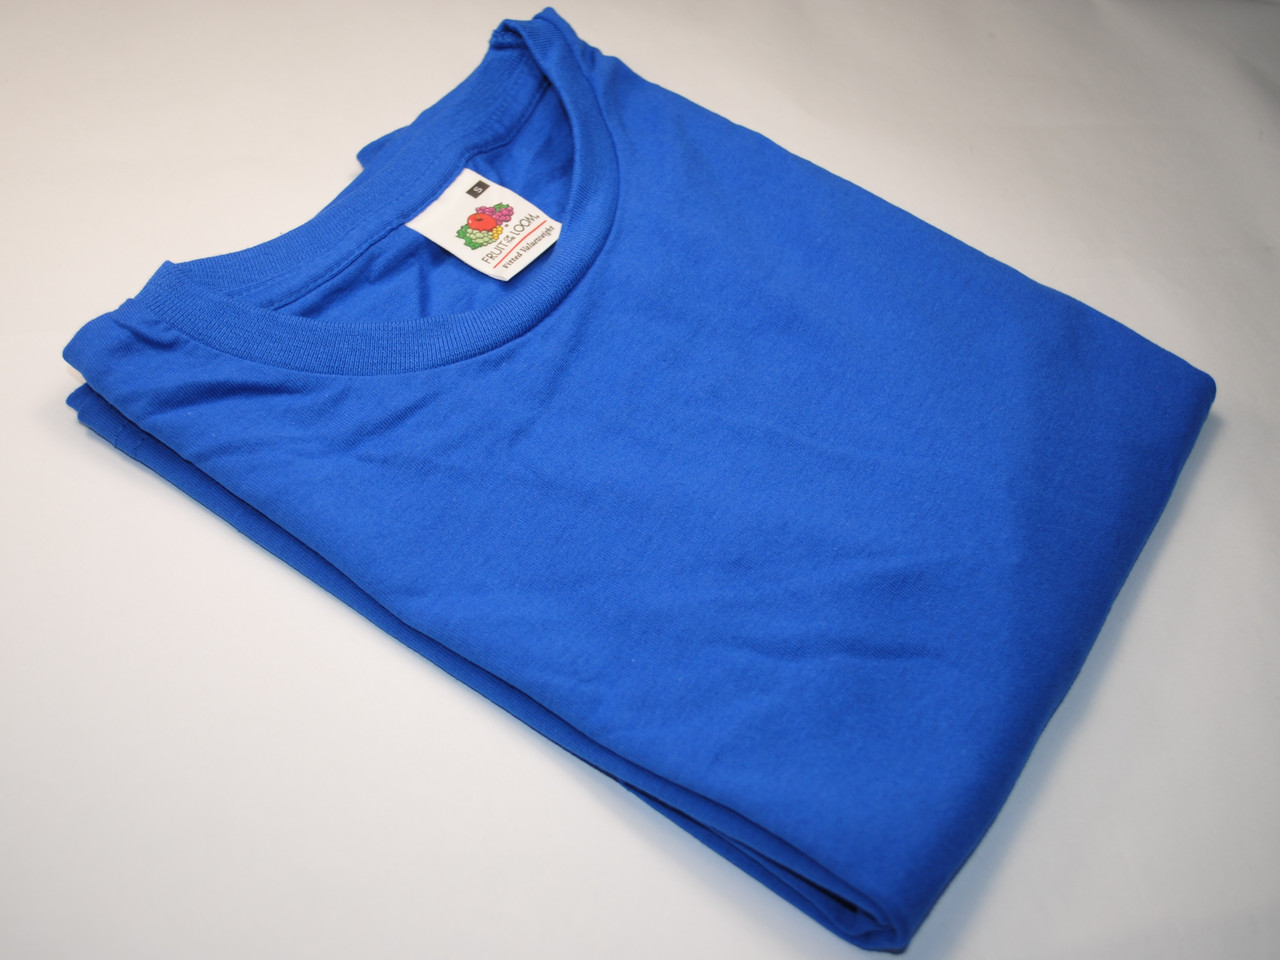 Приталенная мужская футболка Ярко-синяя размер S 61-200-51